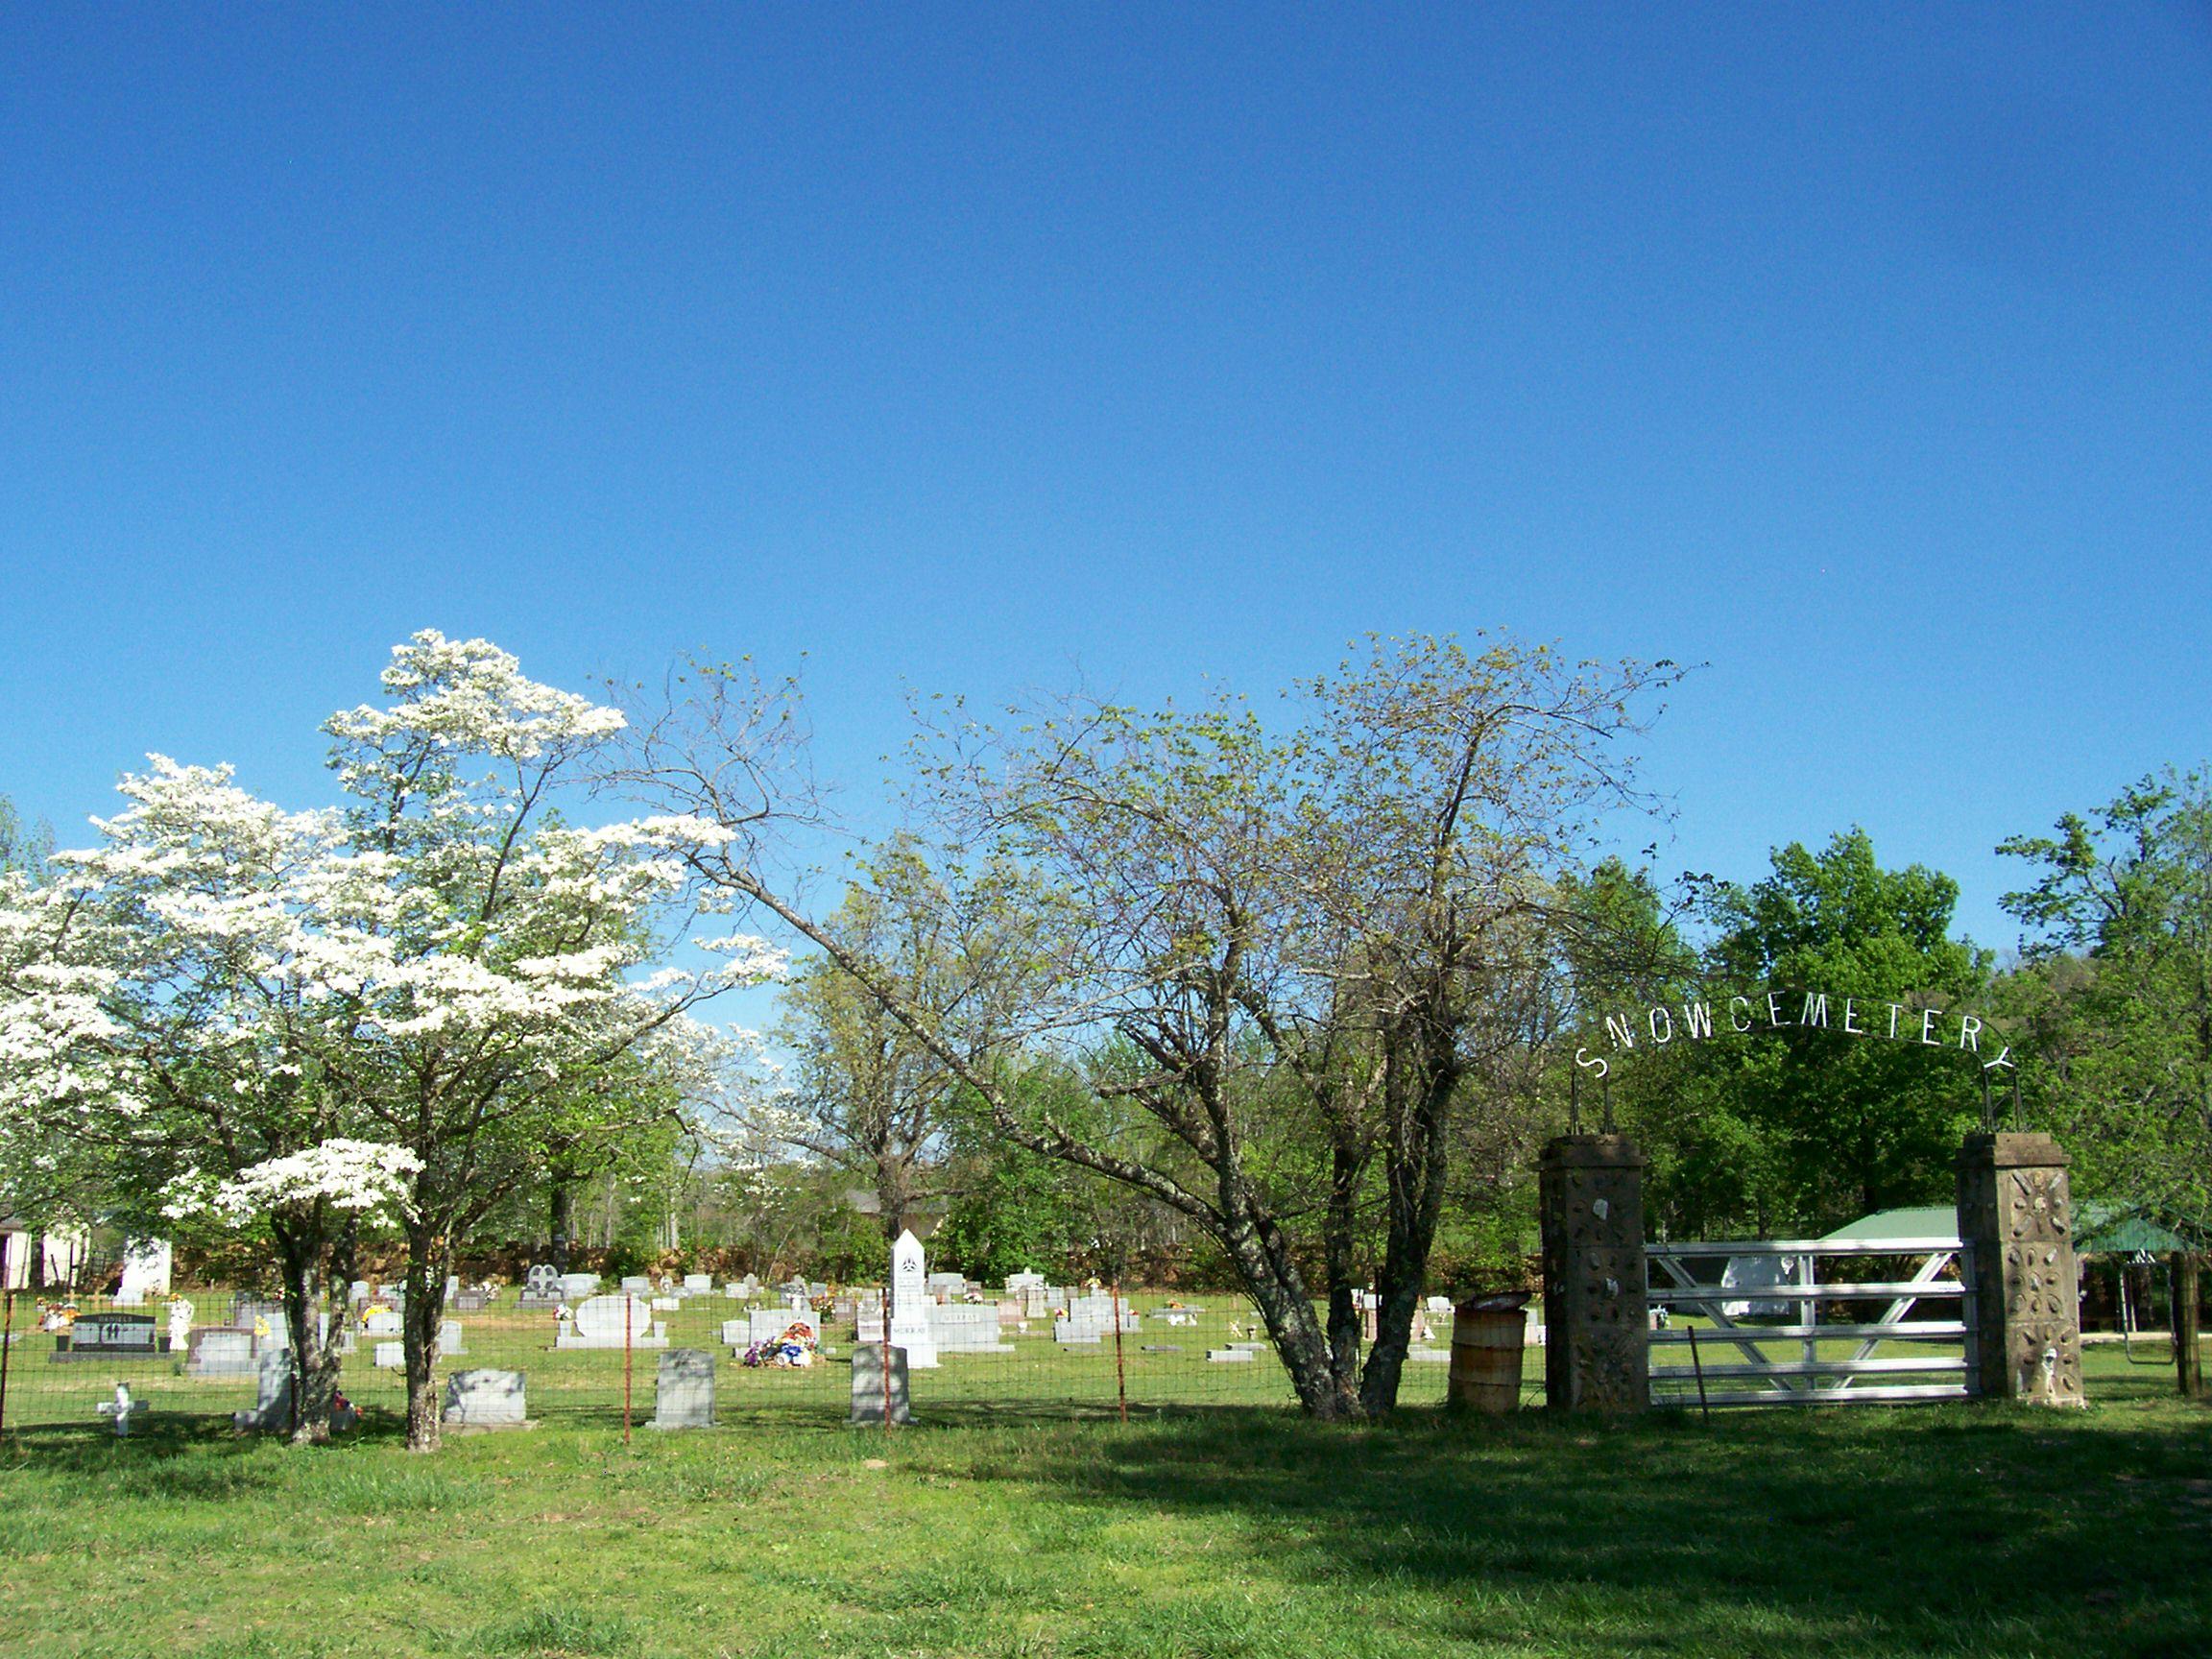 Snow Cemetery